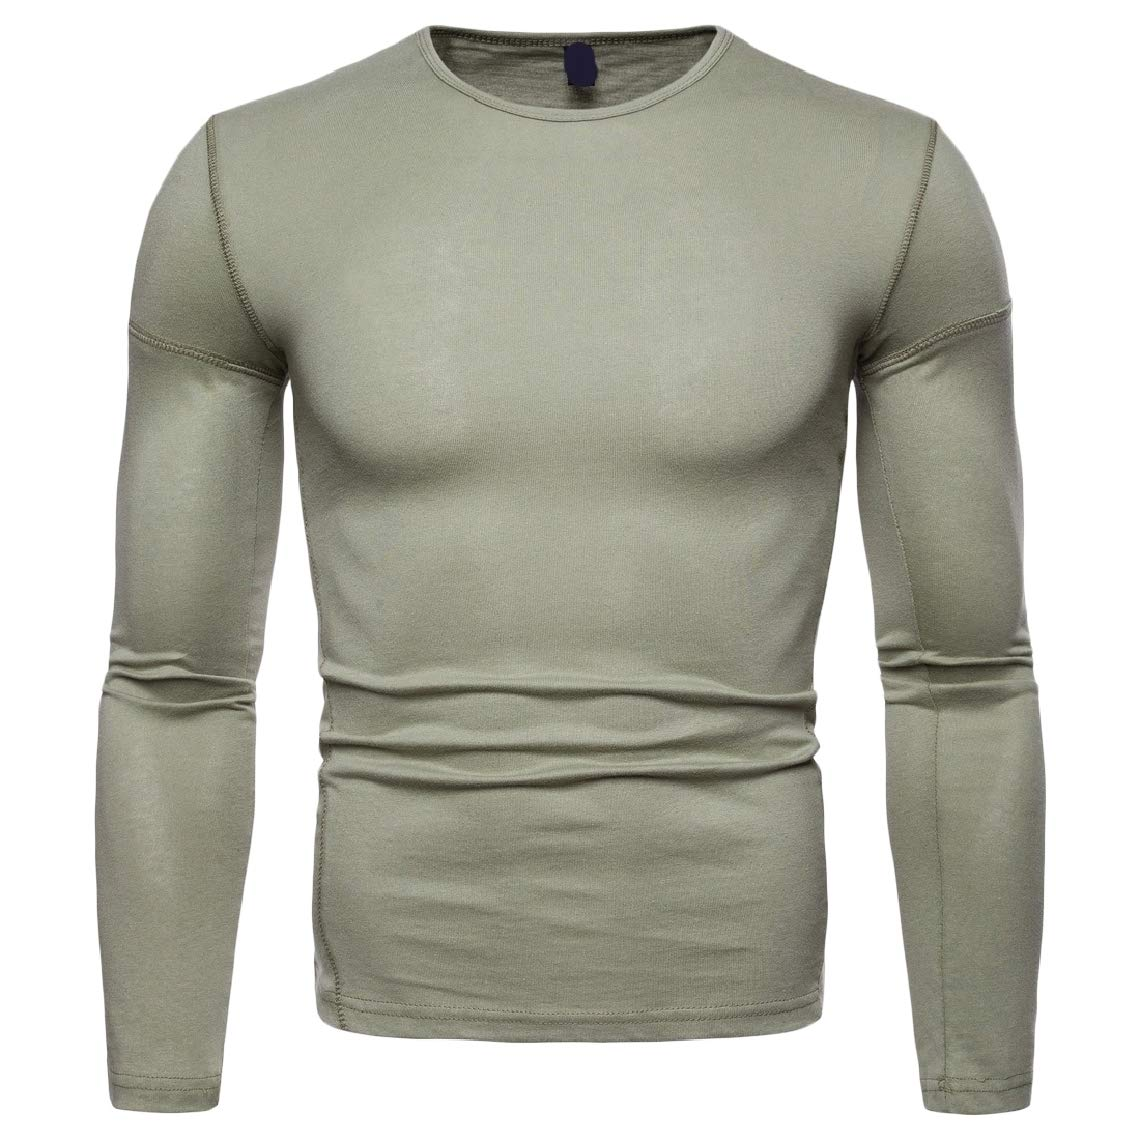 Mirrliy Mens Cozy Solid Crew Neck Fit Long-Sleeve Pullover Tees Top